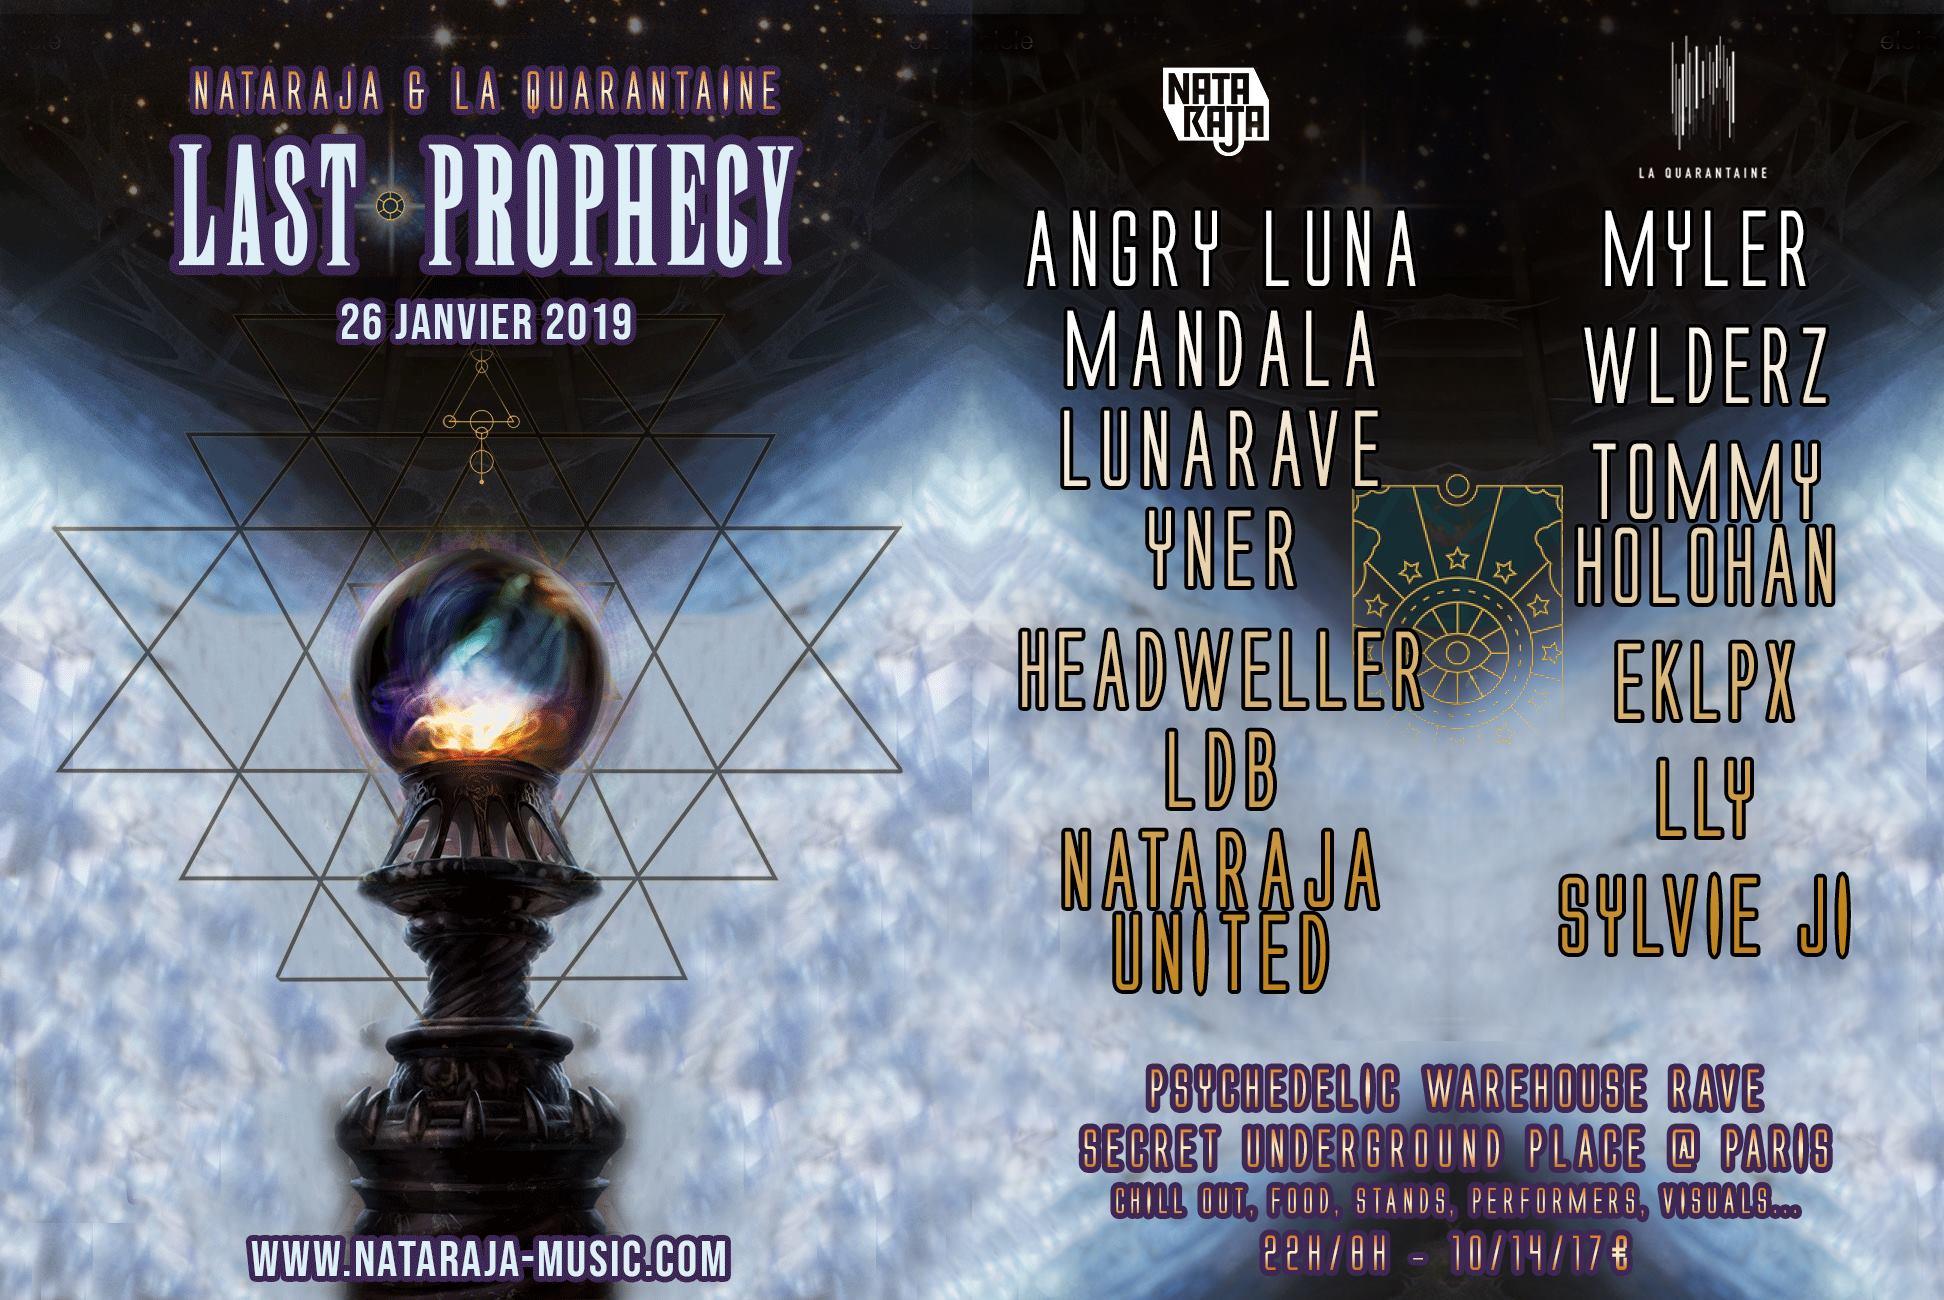 Nataraja x La Quarantaine: Last Prophecy